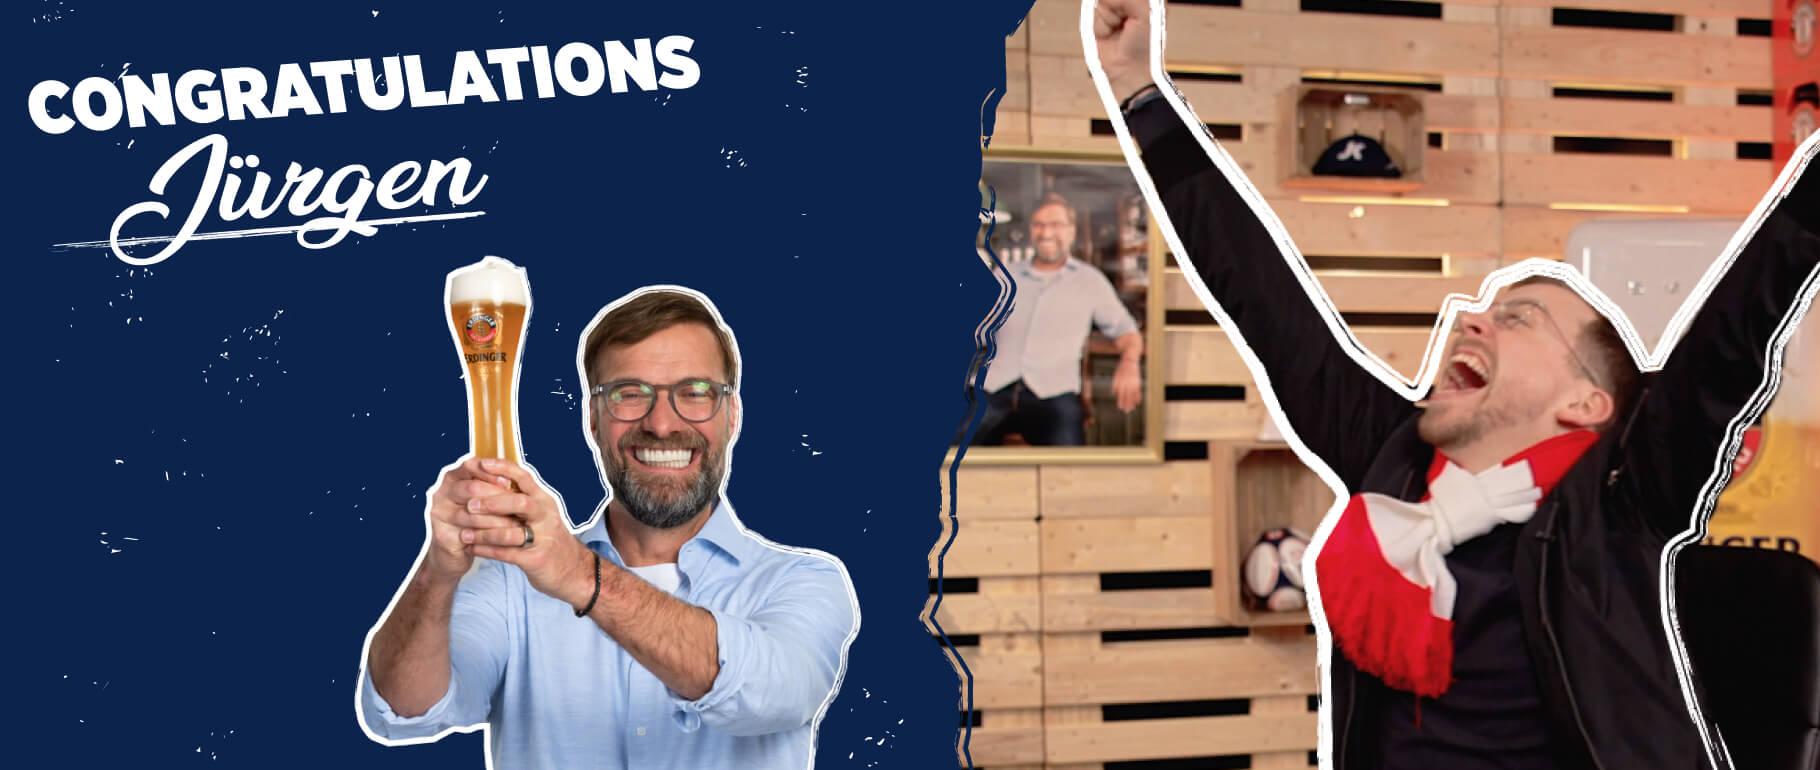 Congratulations Jürgen